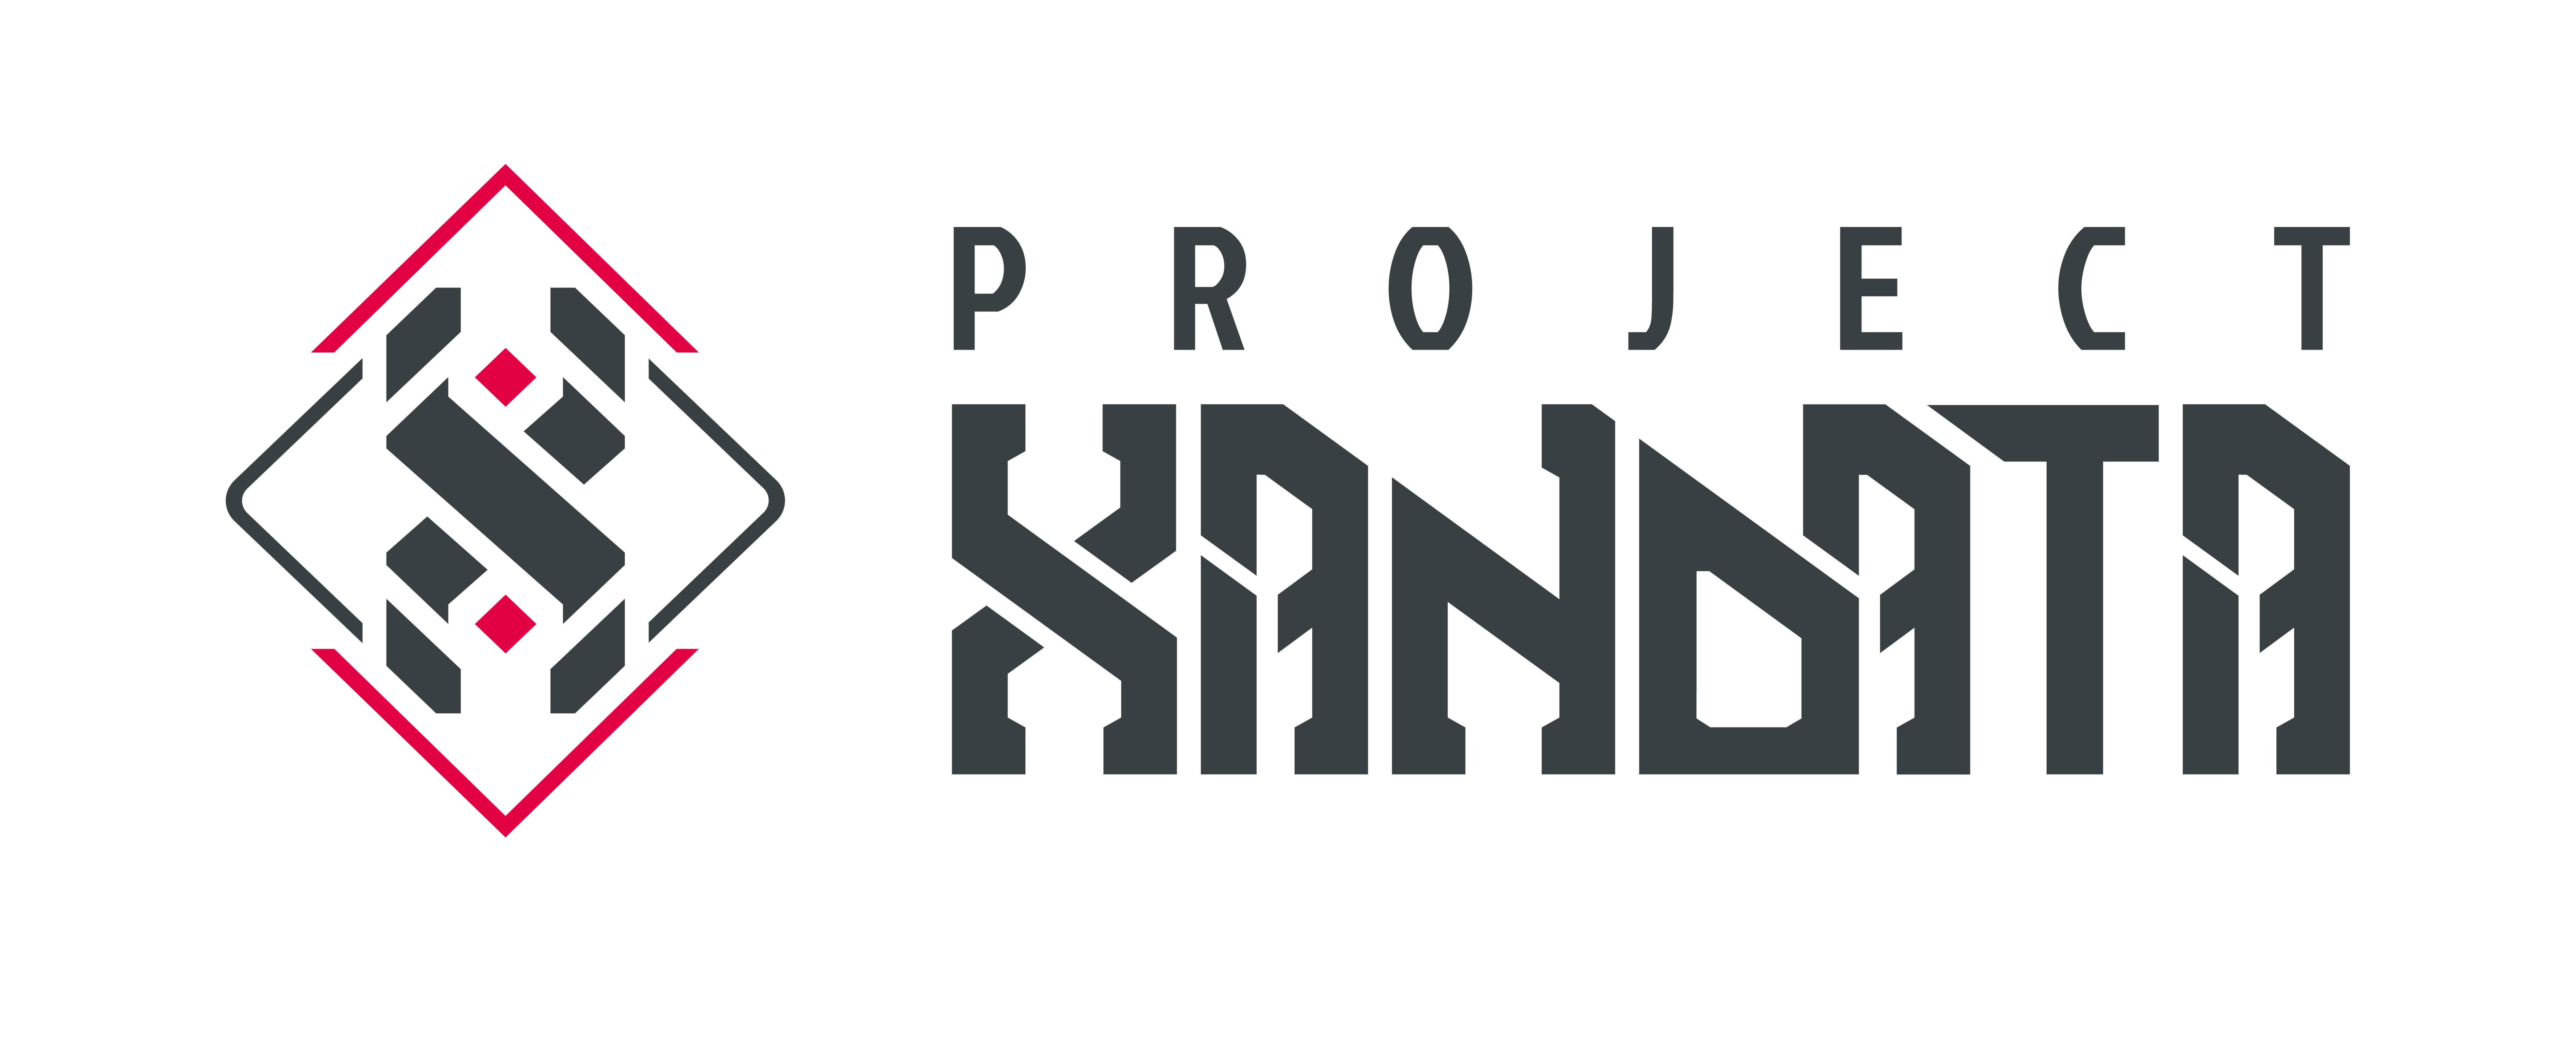 Project Xandata logo